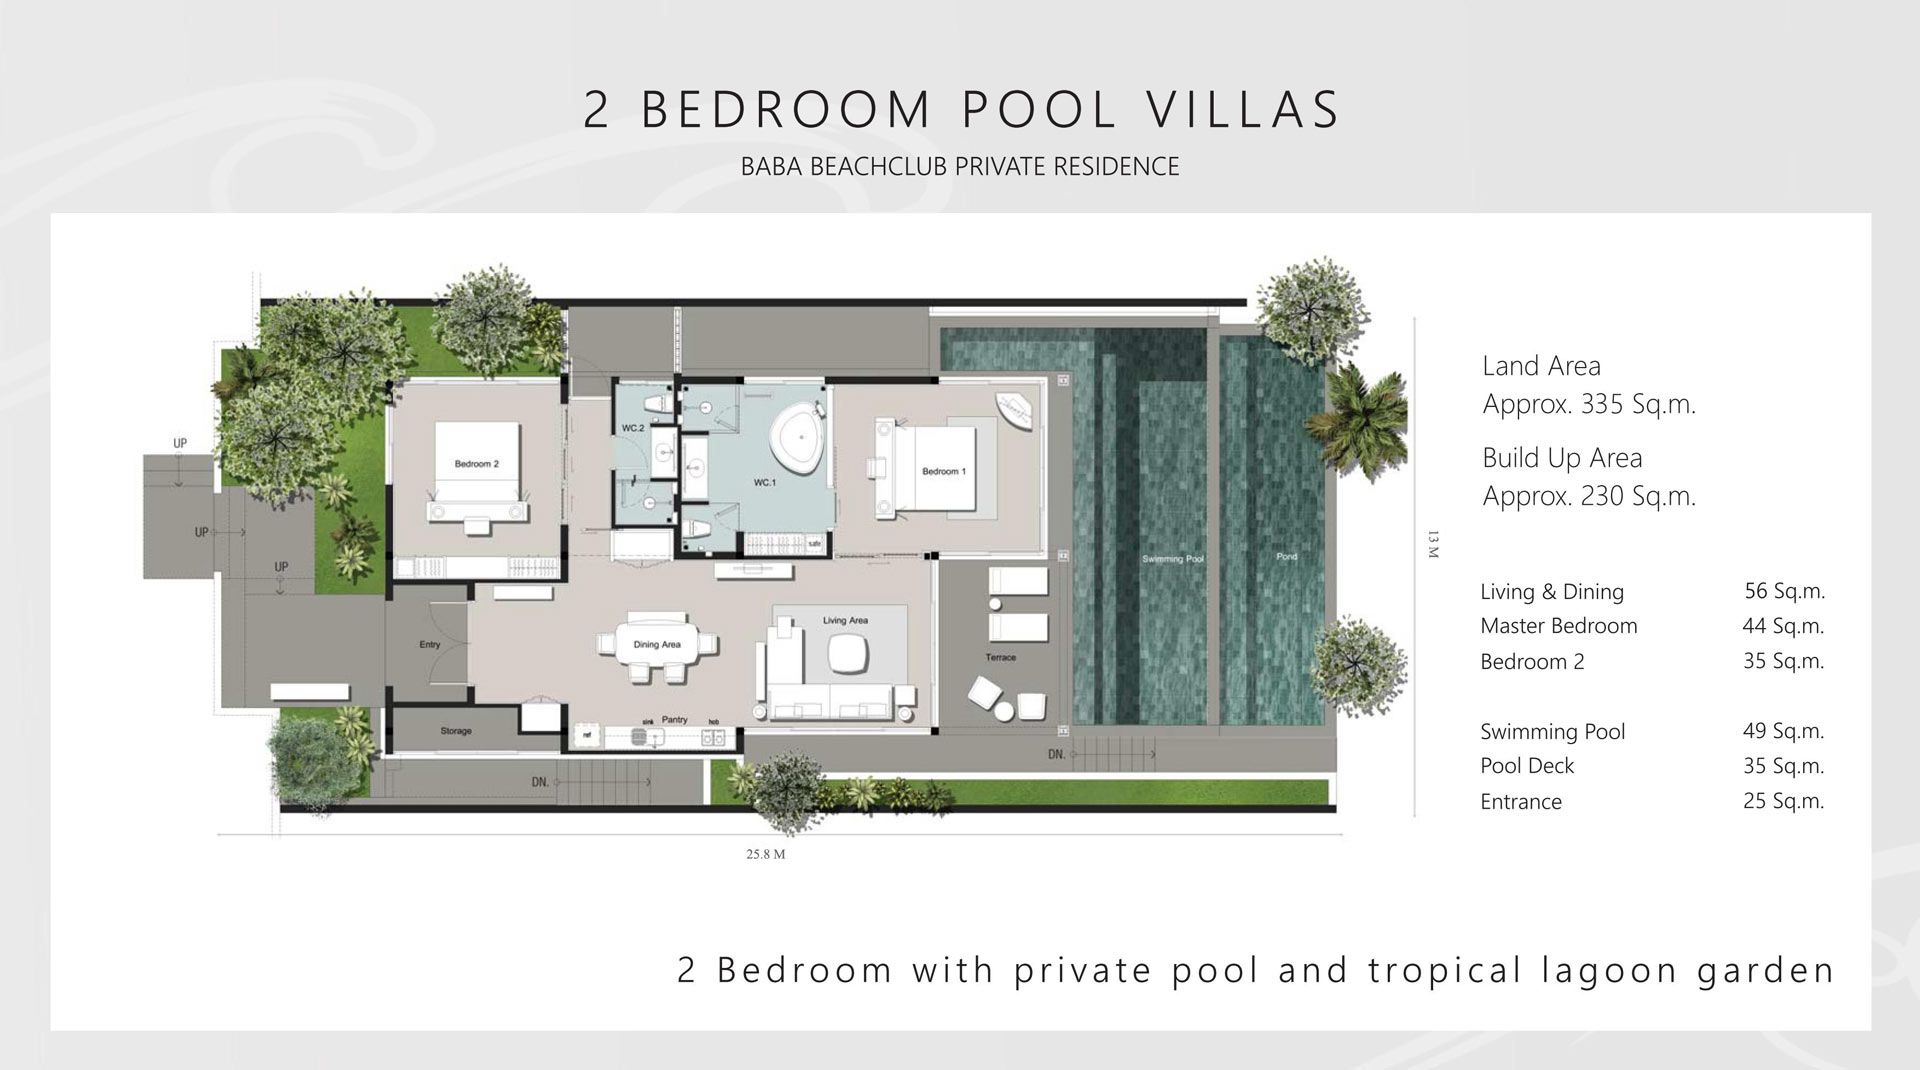 01 Two Bedroom Pool Villa Floor Plan Jpg Resort Design Plan Villa Pool Hotel Room Design Plan